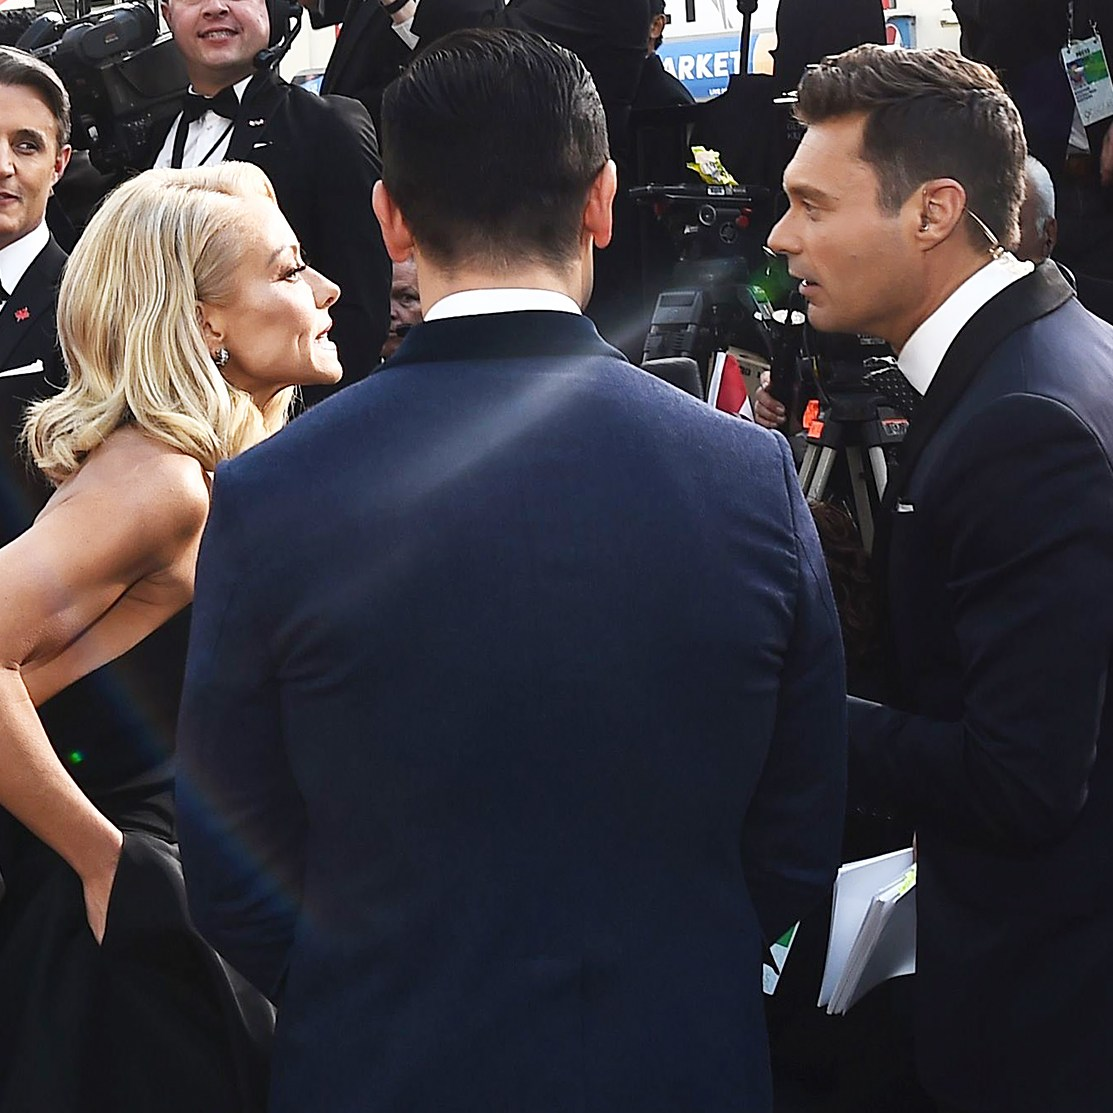 Kelly Ripa Supports Ryan Seacrest on Oscars 2018 Red Carpet